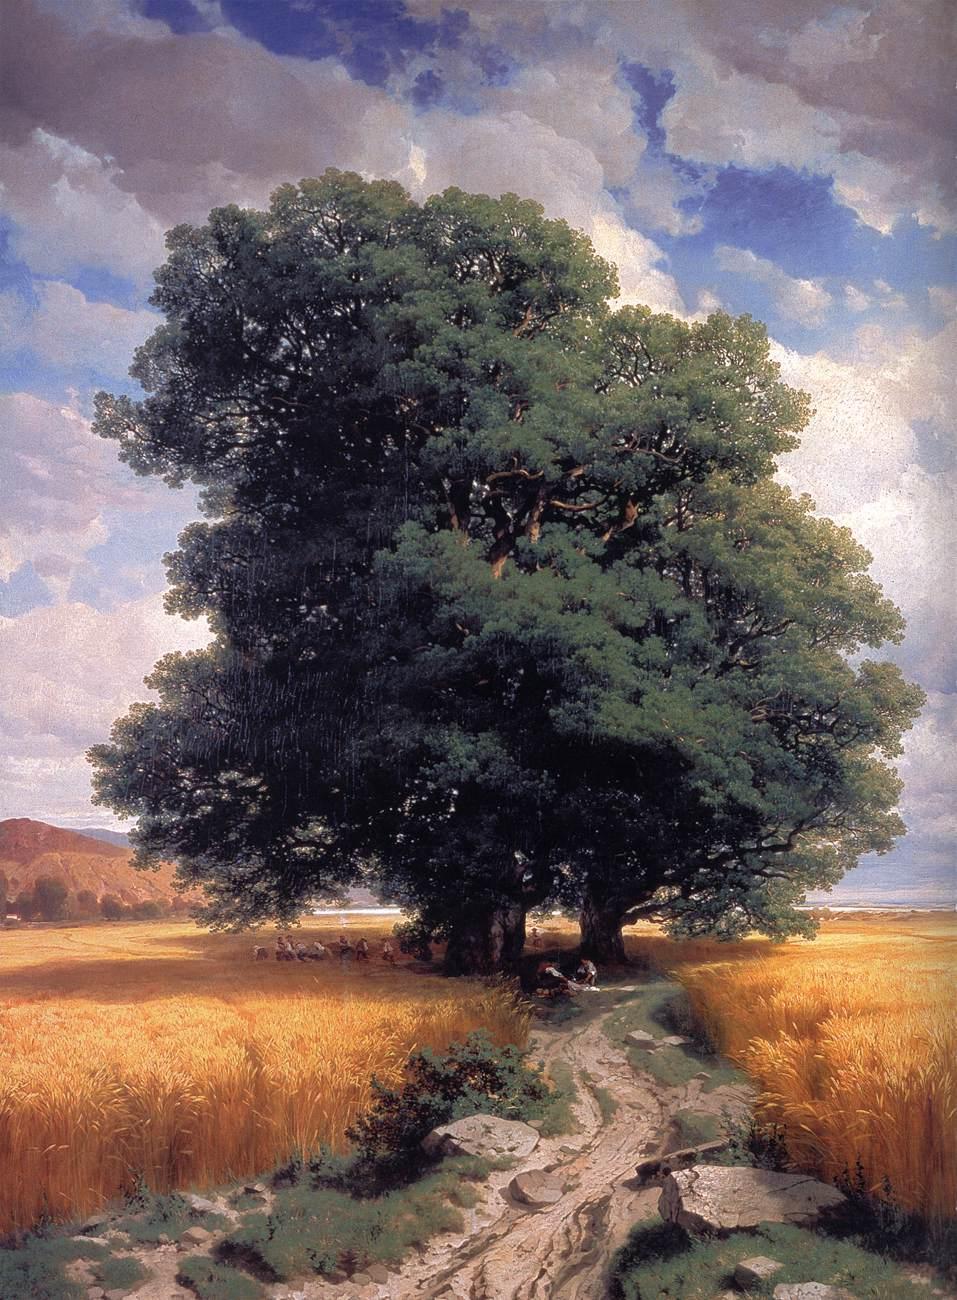 http://www.wga.hu/art/c/calame/landscap.jpg